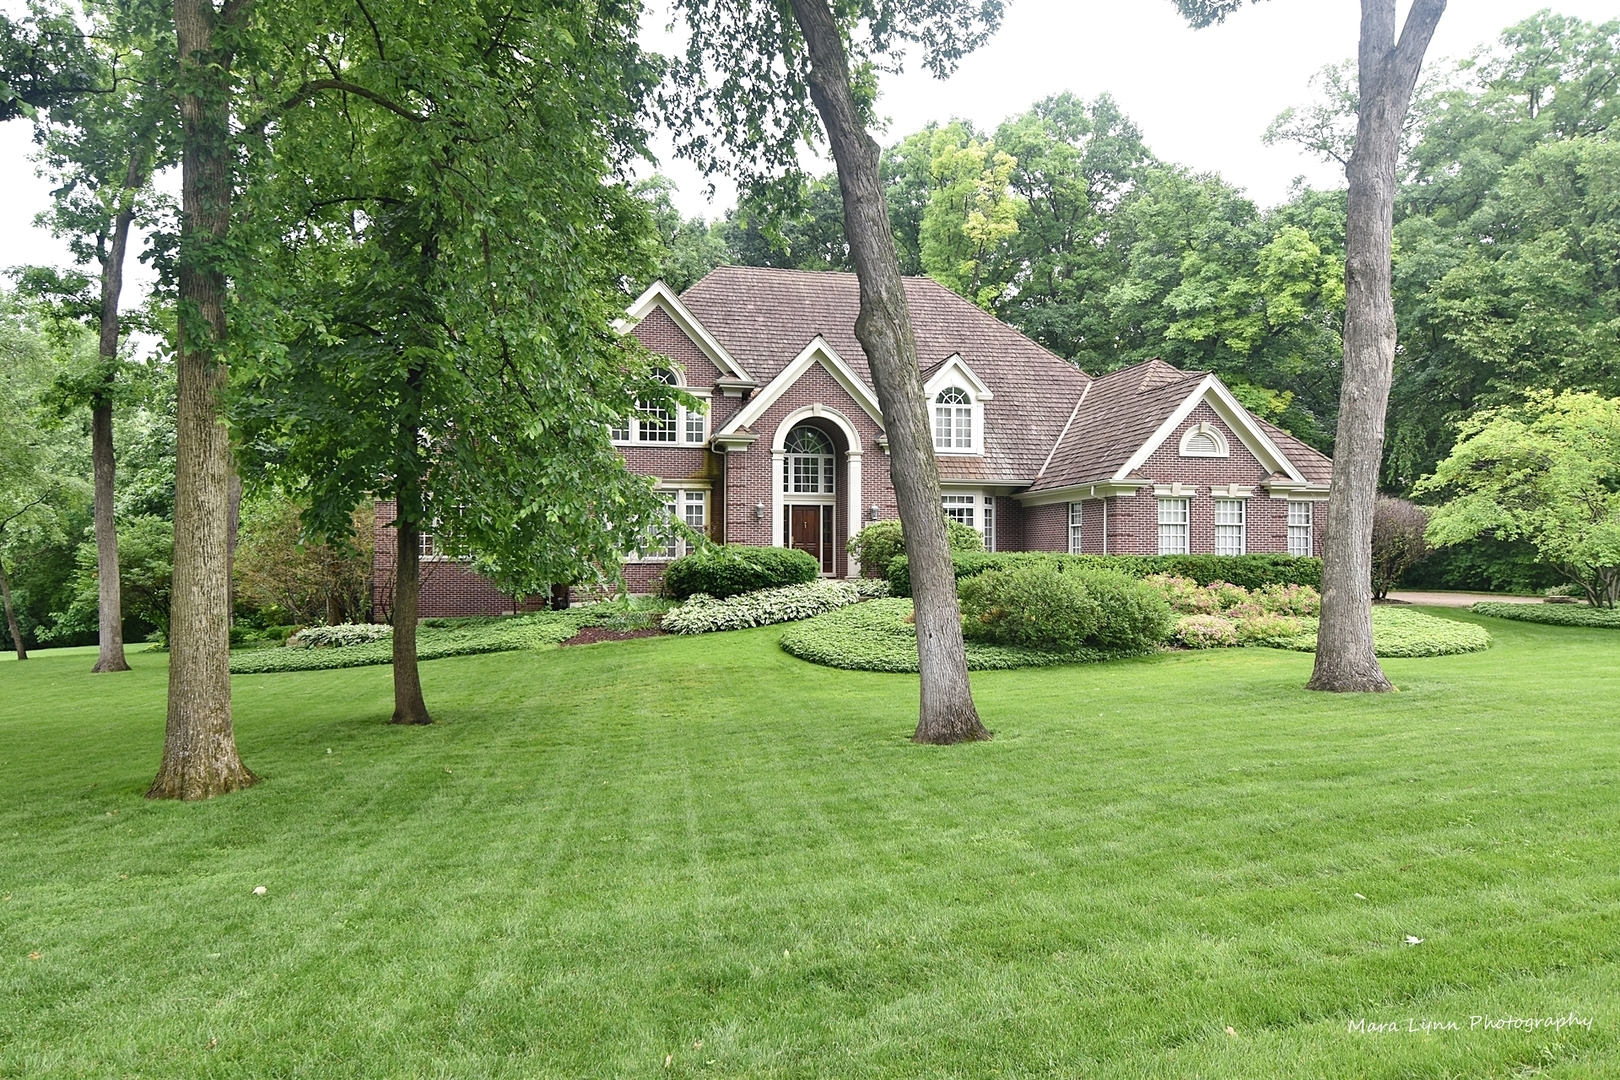 3017 Glen Eagles, ST. CHARLES, Illinois, 60174